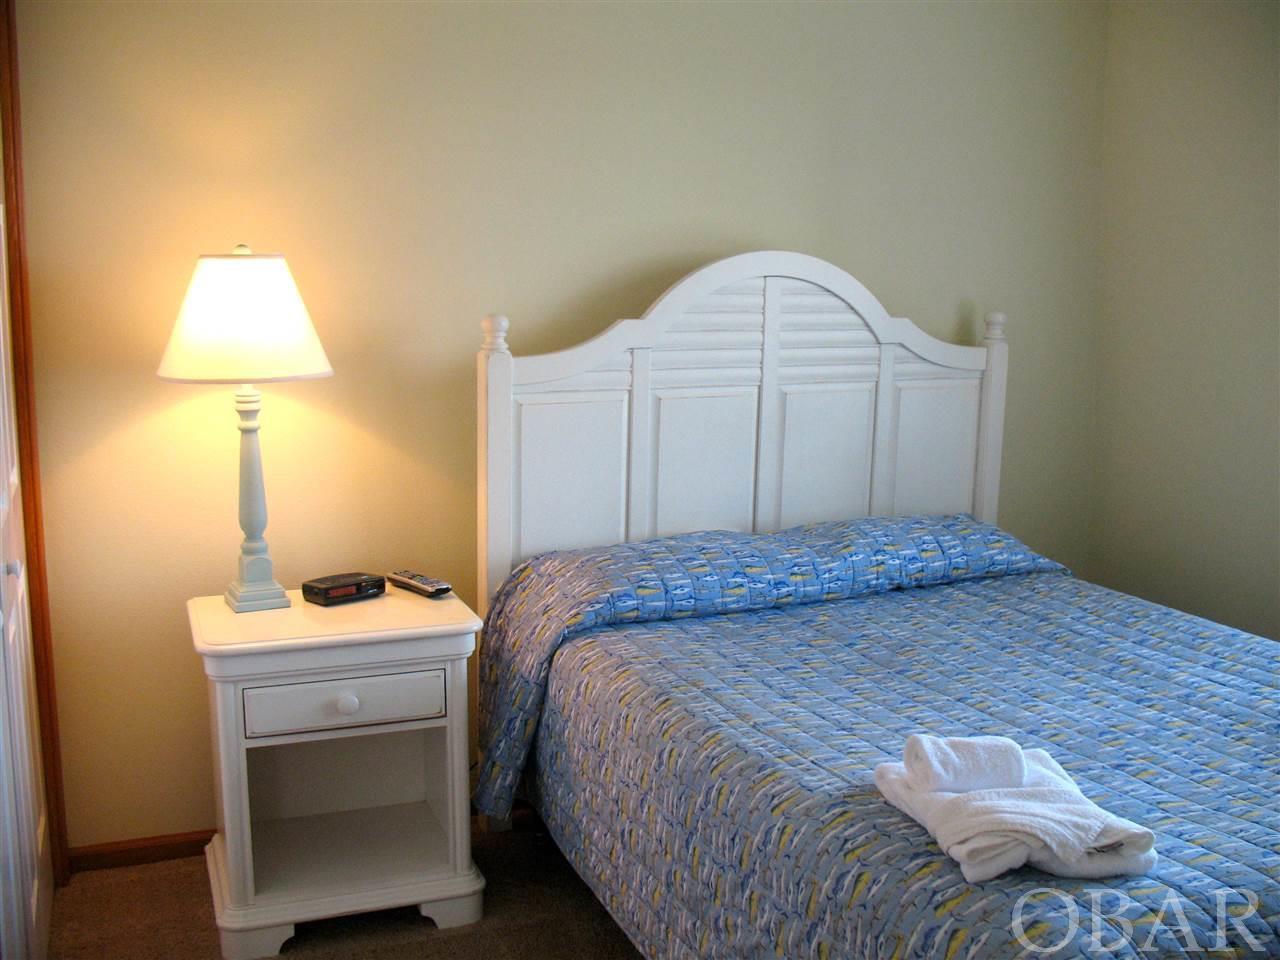 5203 Links Drive,Nags Head,NC 27959,4 Bedrooms Bedrooms,3 BathroomsBathrooms,Residential,Links Drive,94772